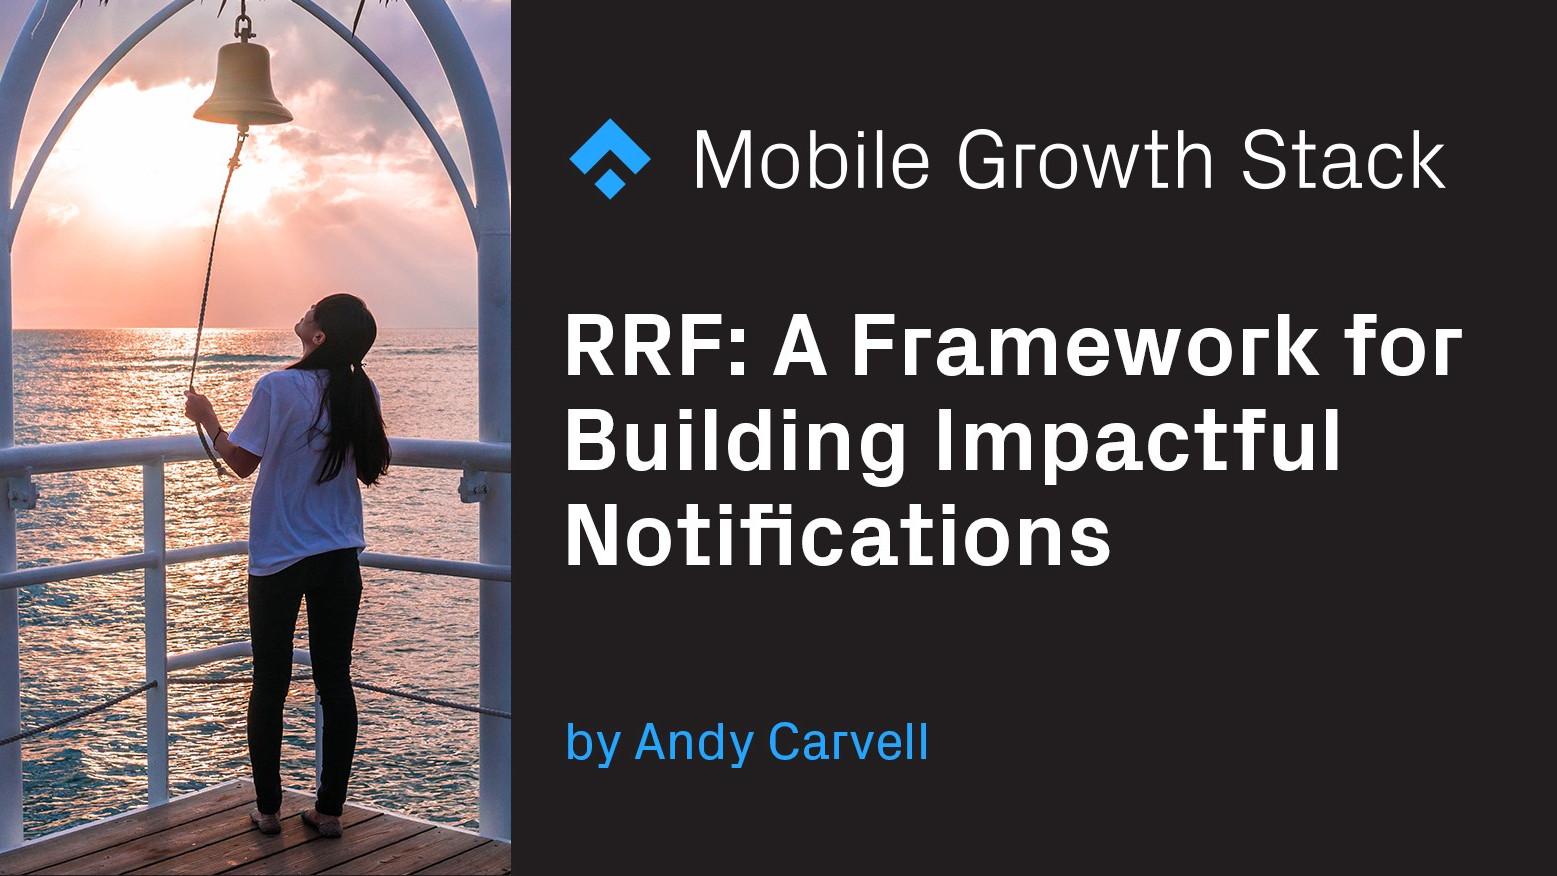 rff framework for building impactful notifications